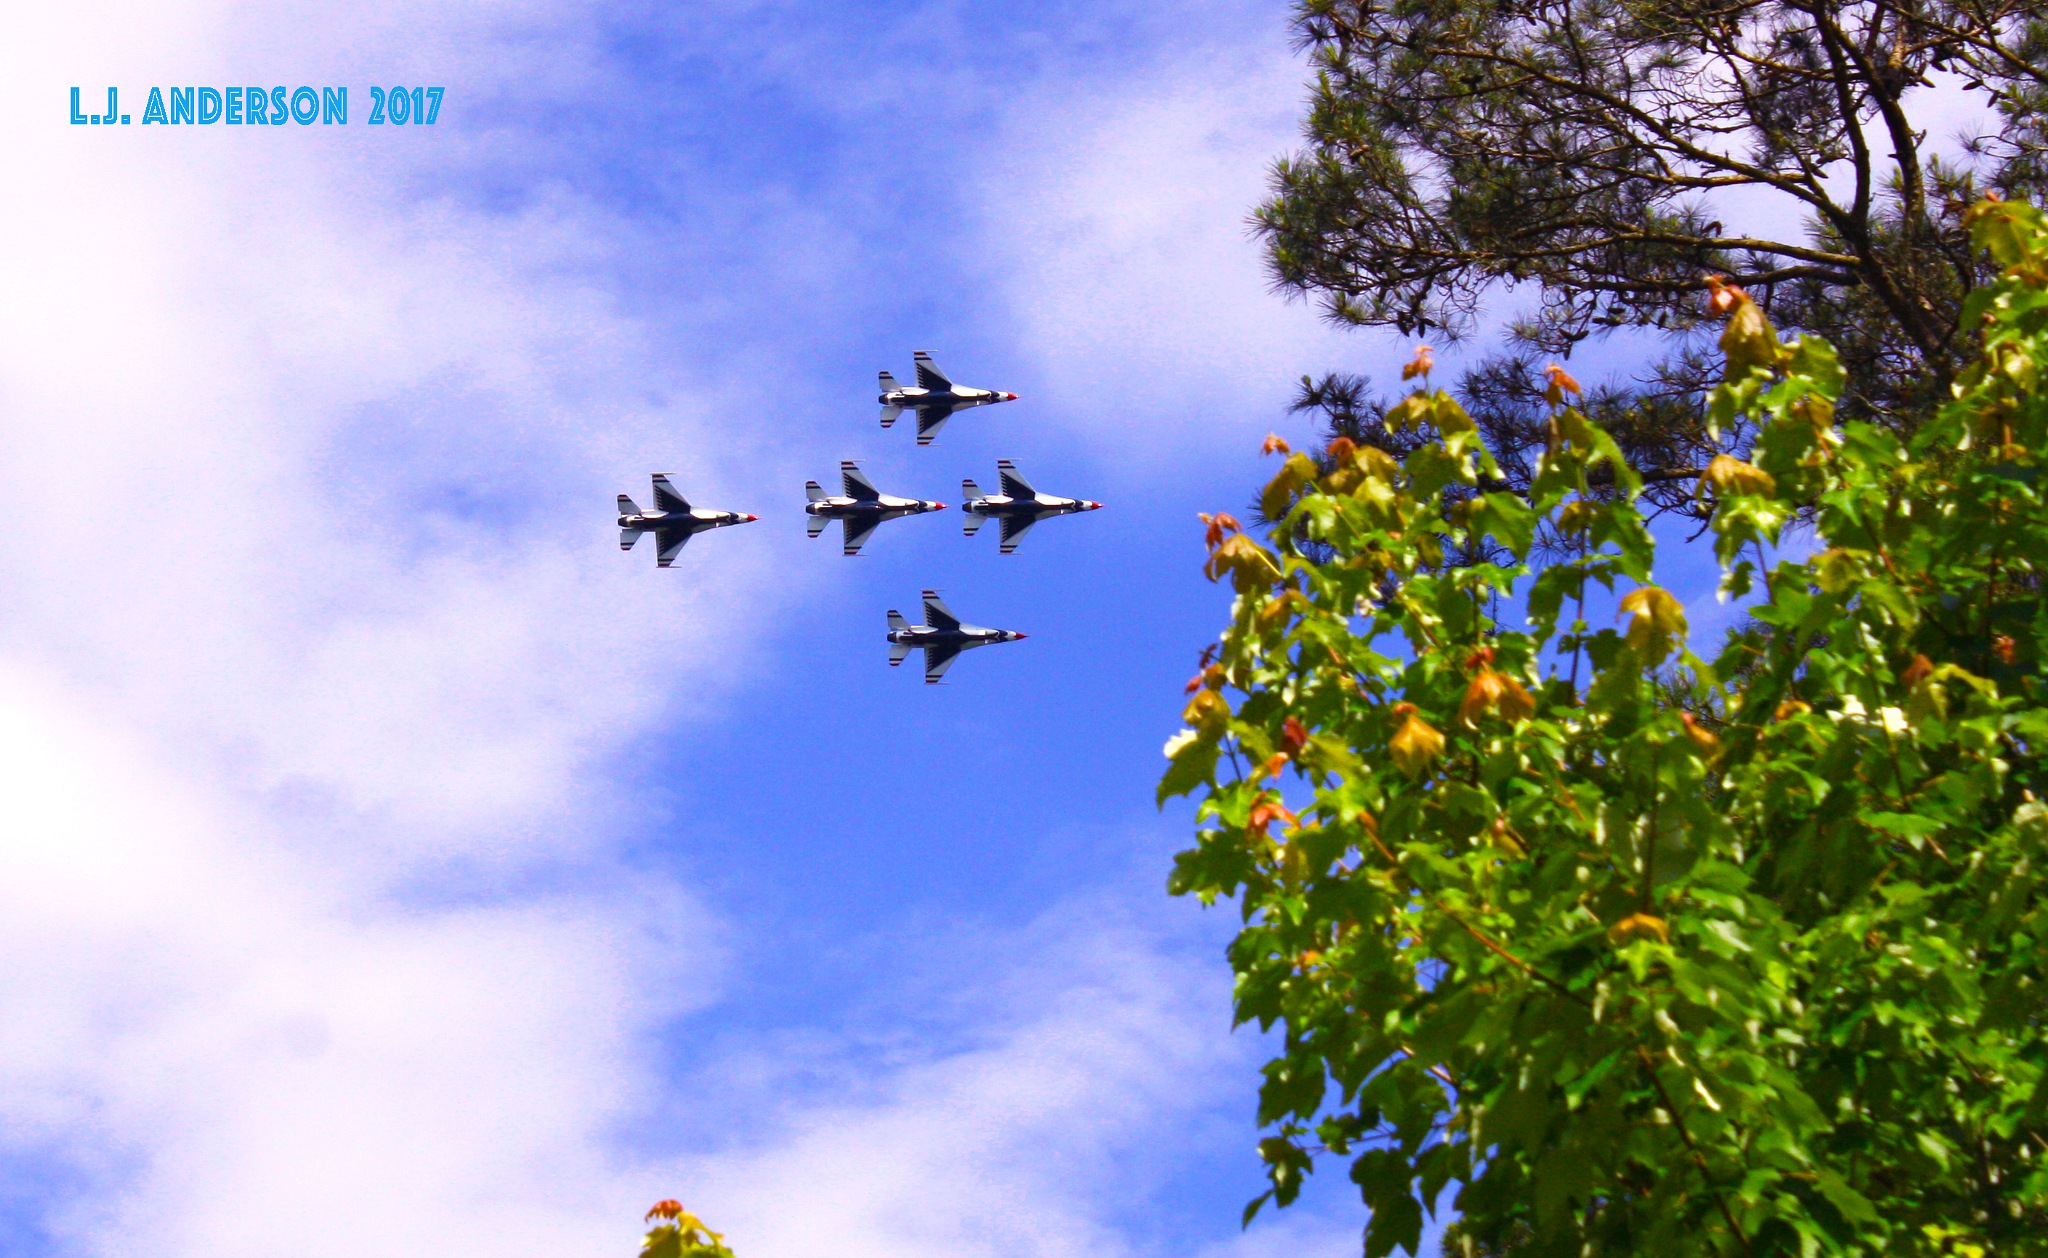 Thunderbirds by Linda (L J ) Anderson